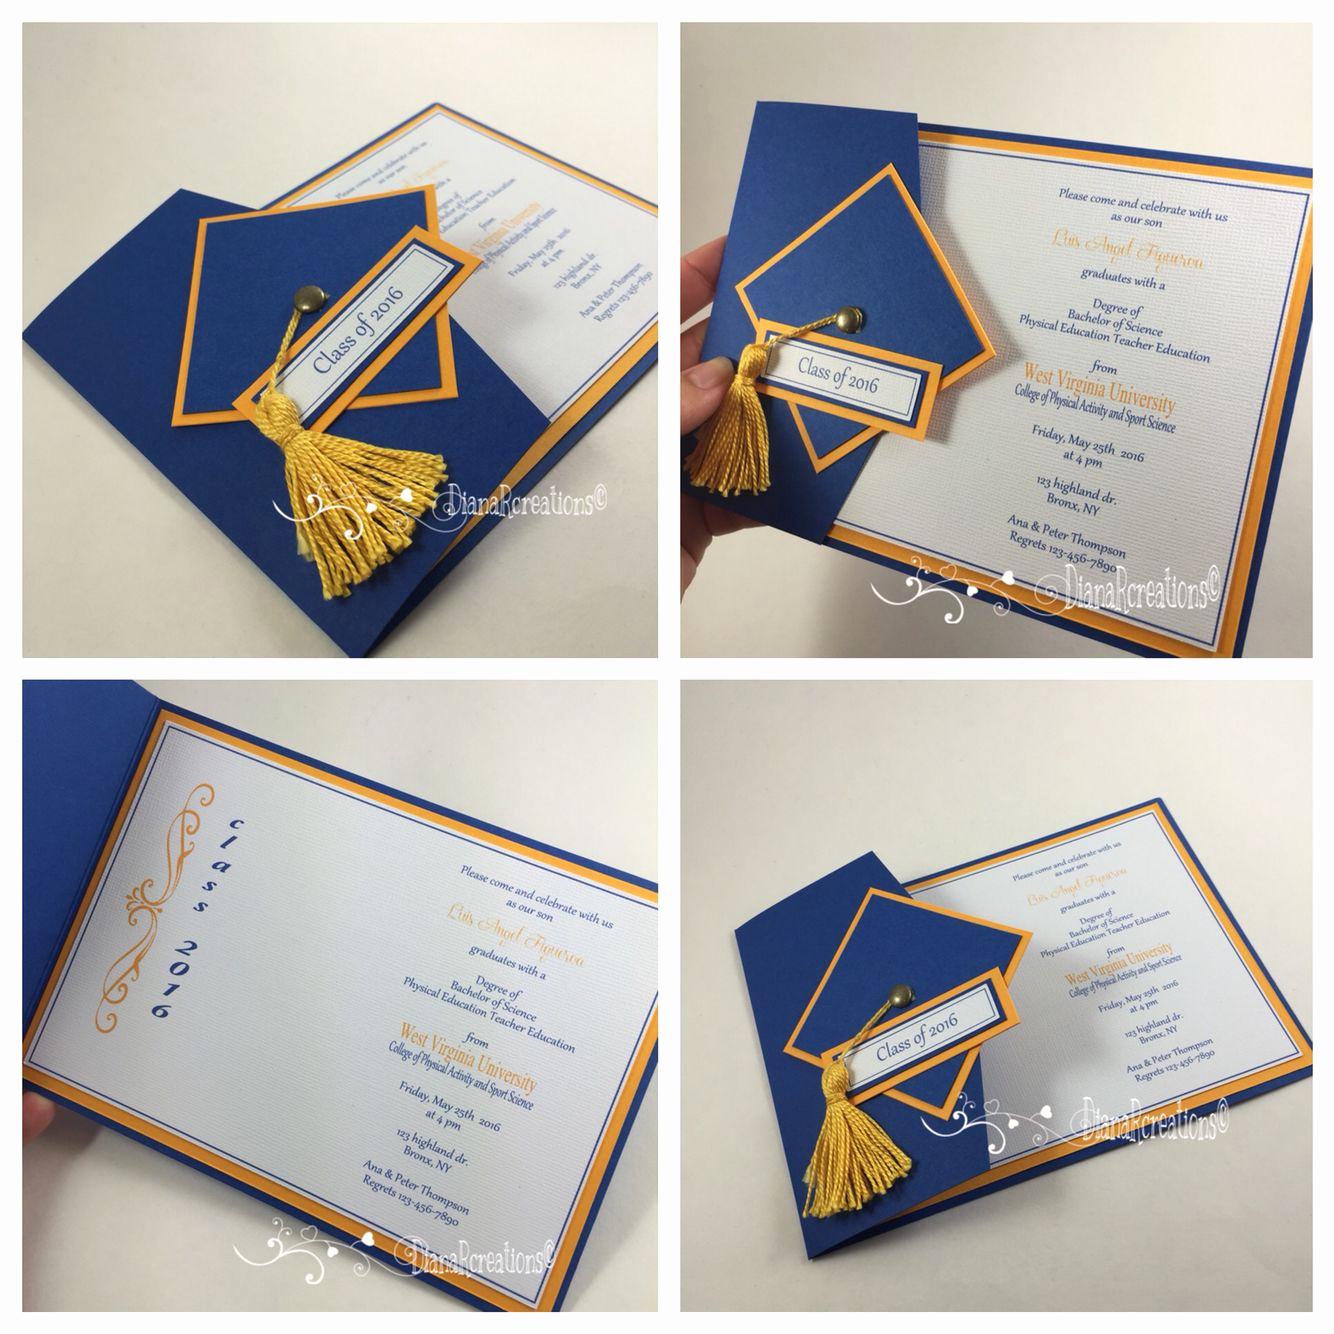 Homemade Graduation Invitation Ideas Best Of Graduation Invitations Dianarcreations Invitations